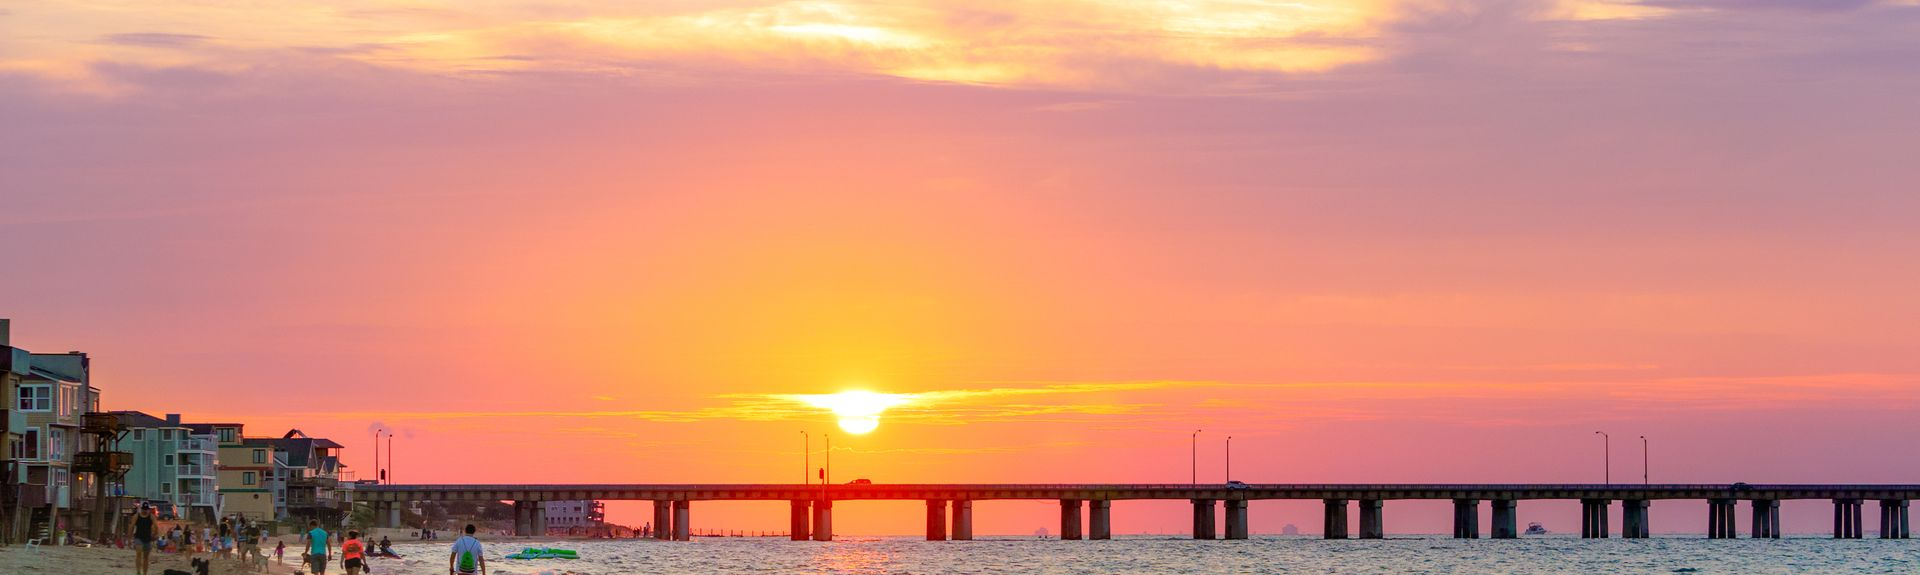 Chesapeake Bay, United States of America